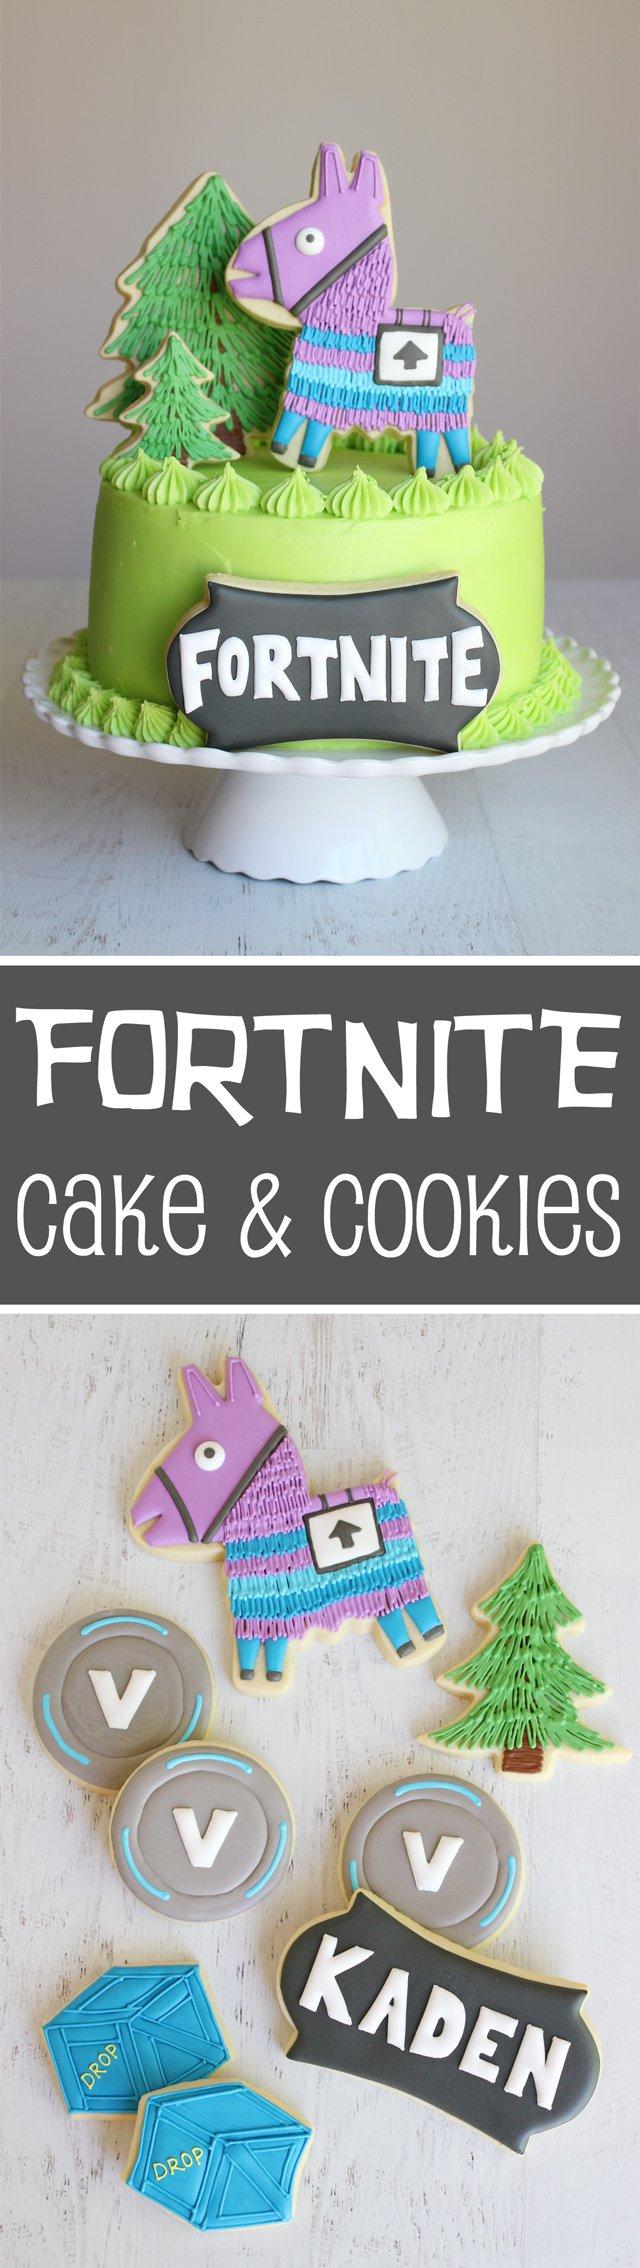 Fortnite Birthday Cake & Cookies